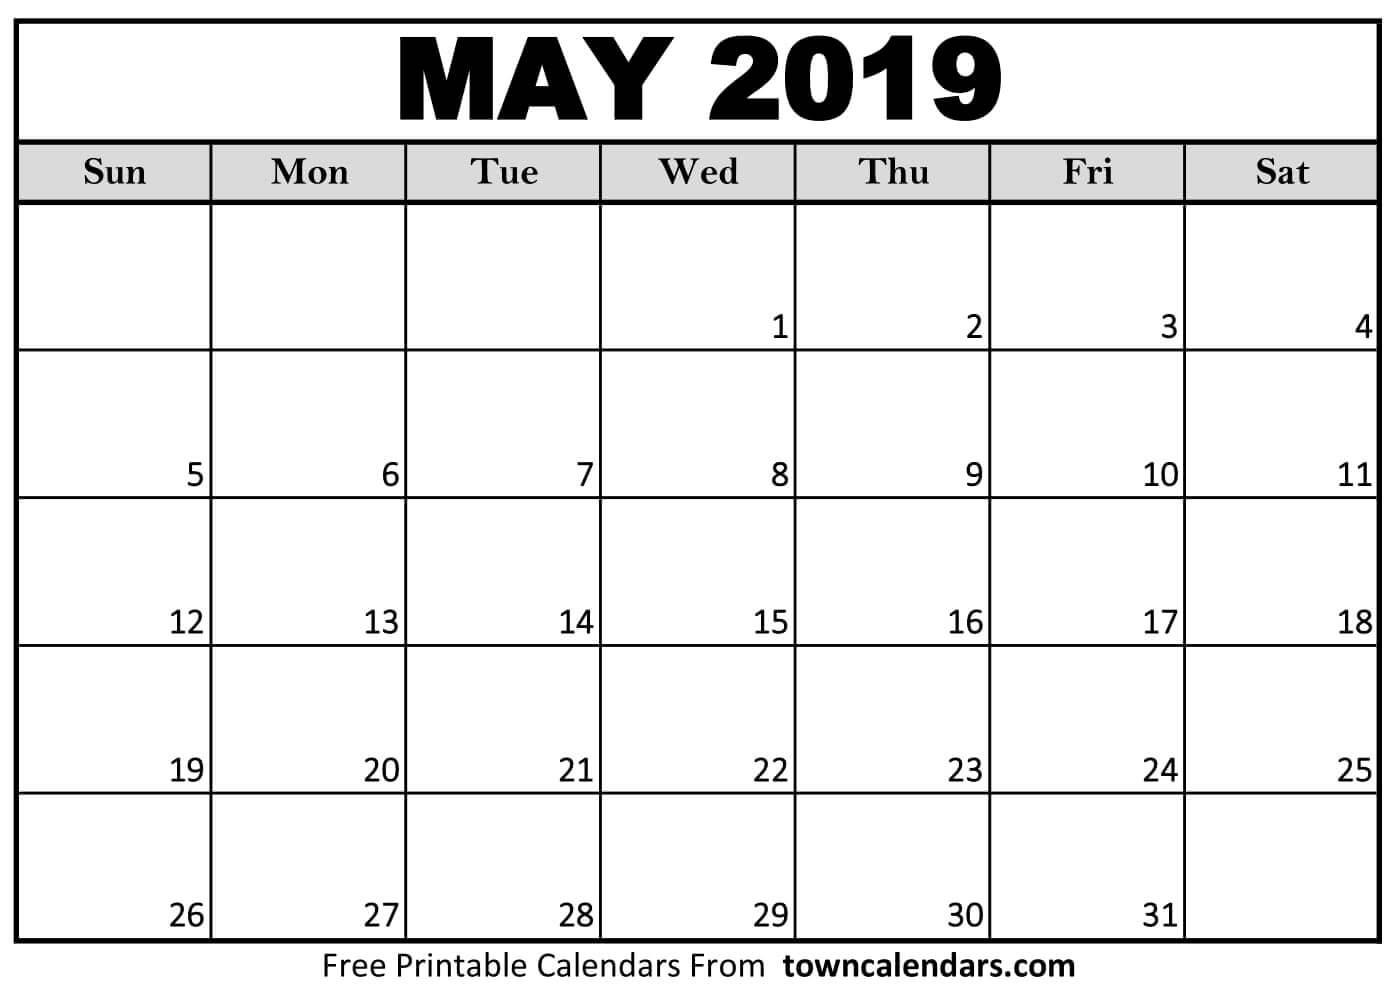 Printable May 2019 Calendar towncalendars